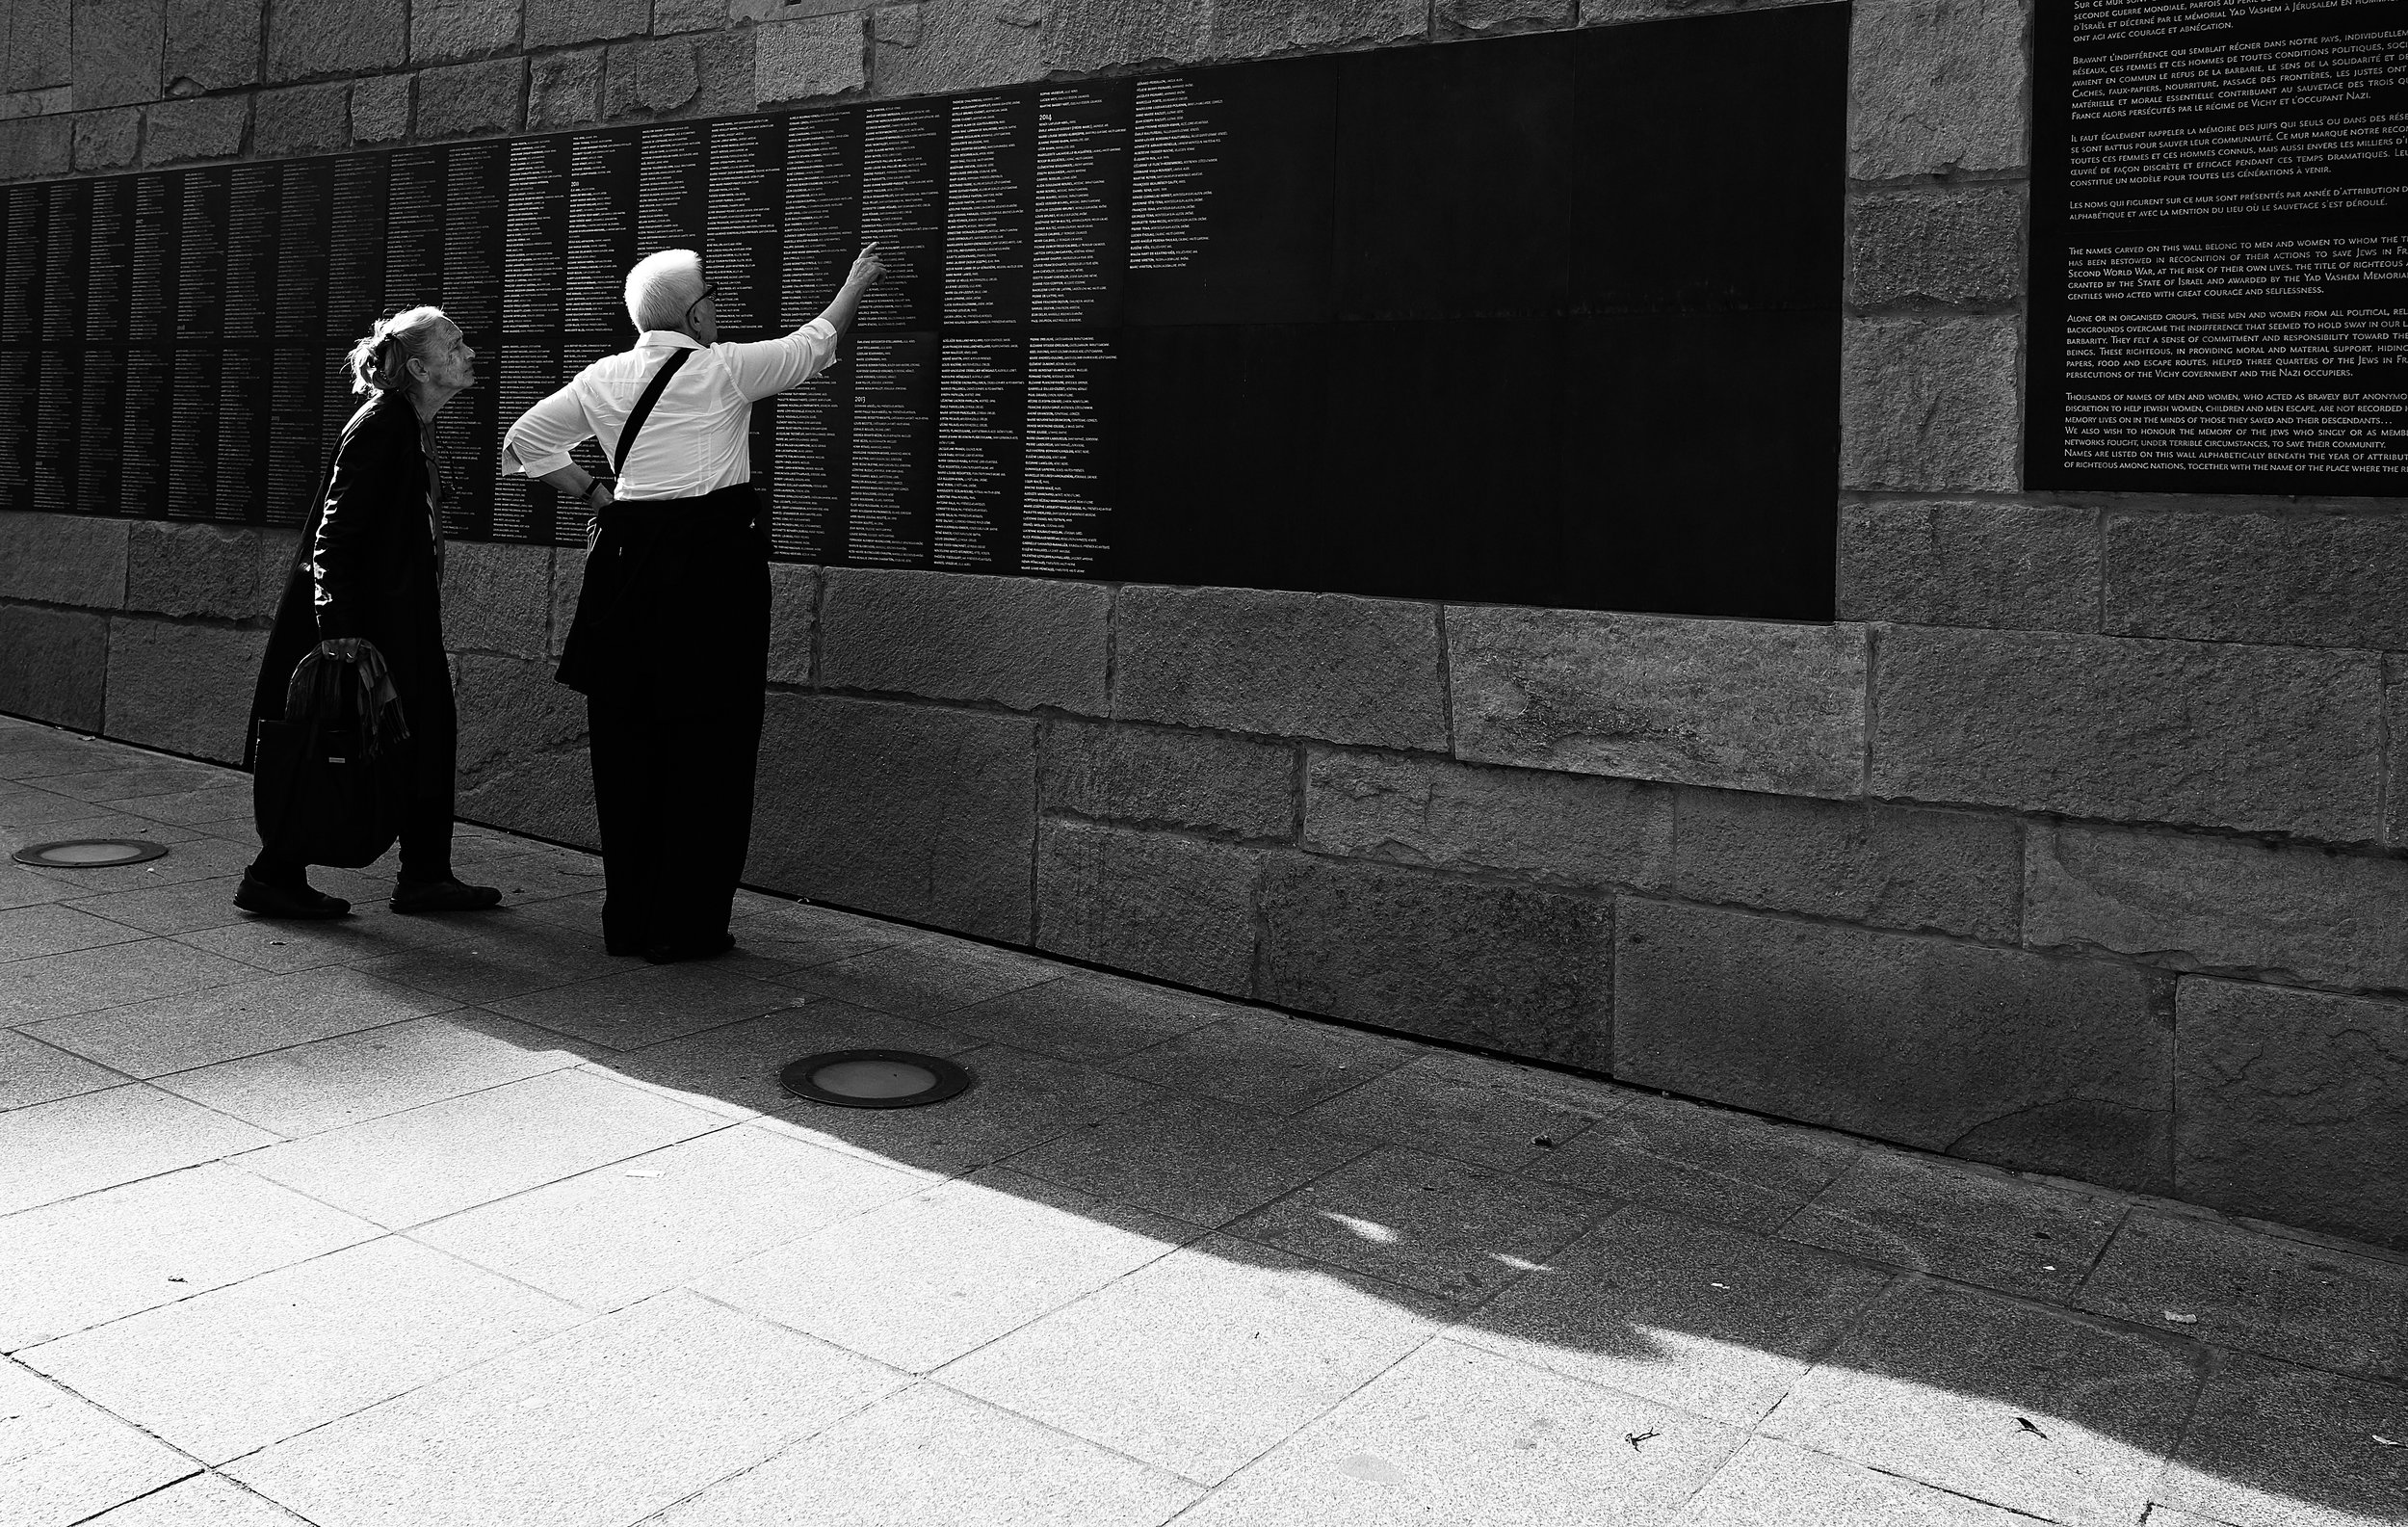 Mur des Justes1600x1200 sRGB.jpg